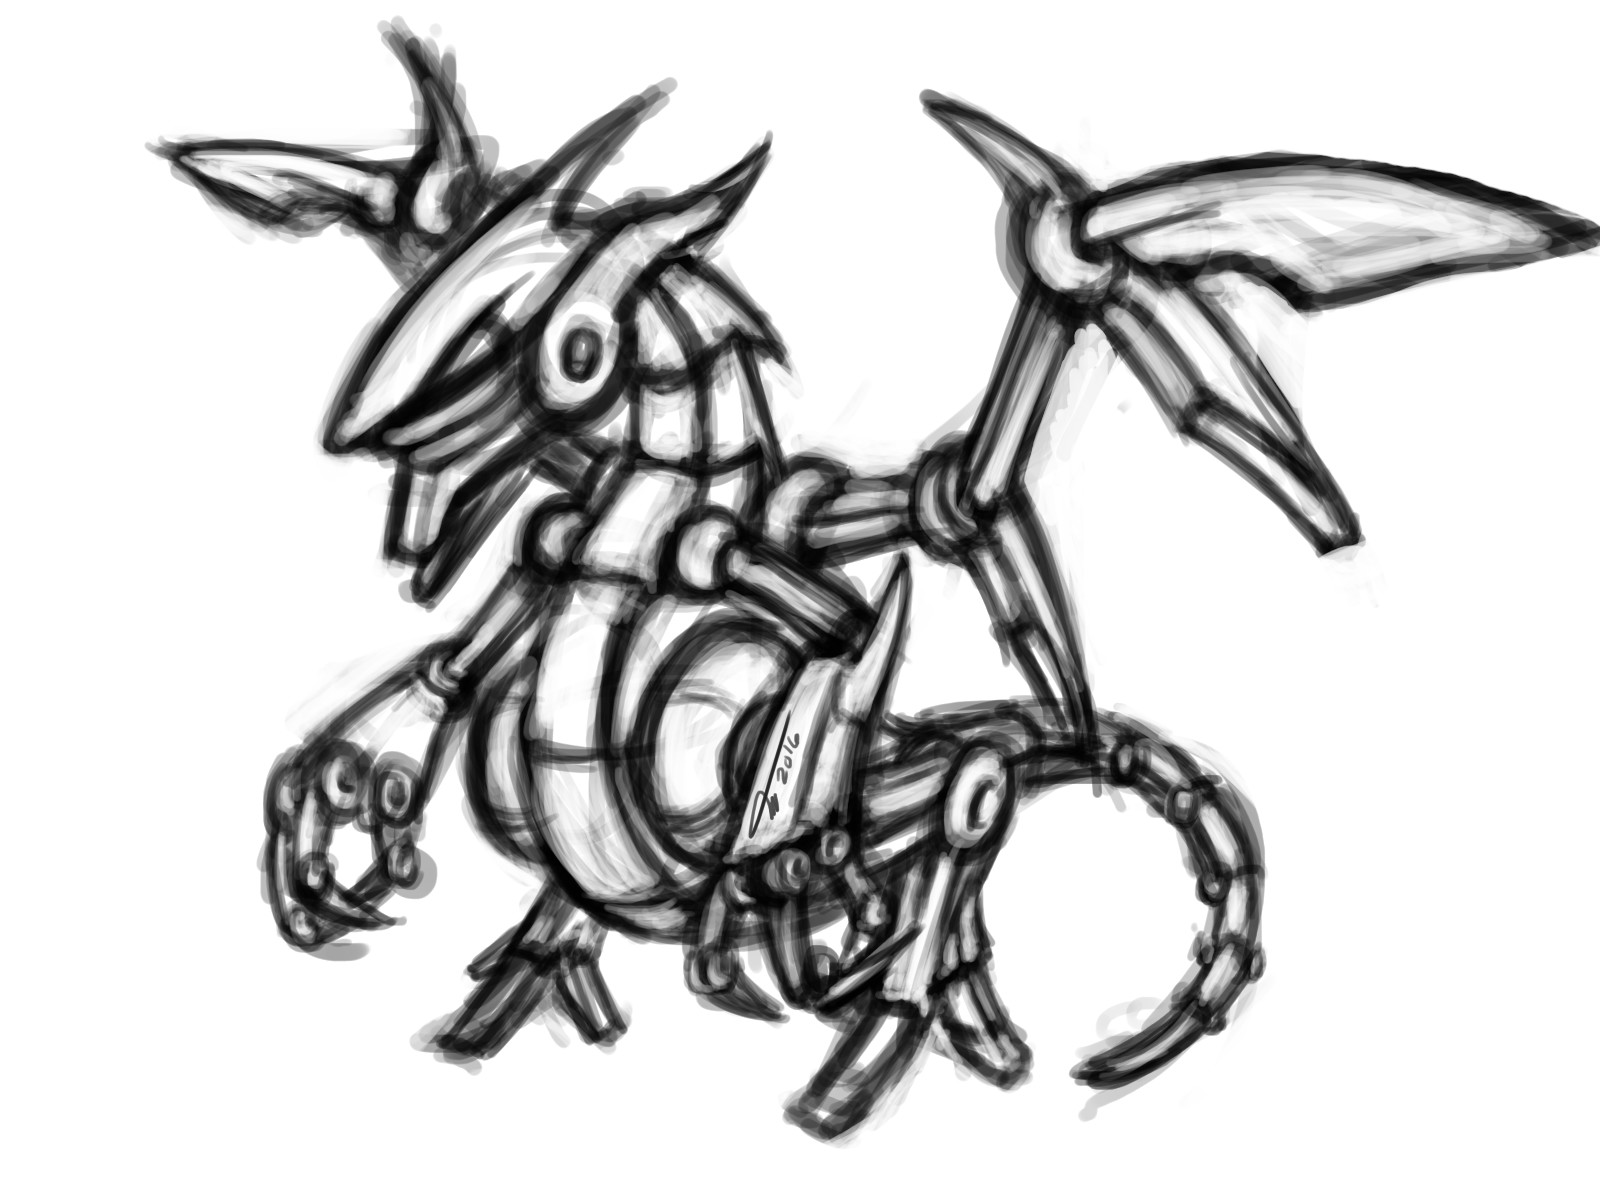 Arcadeous phoenix dragomech